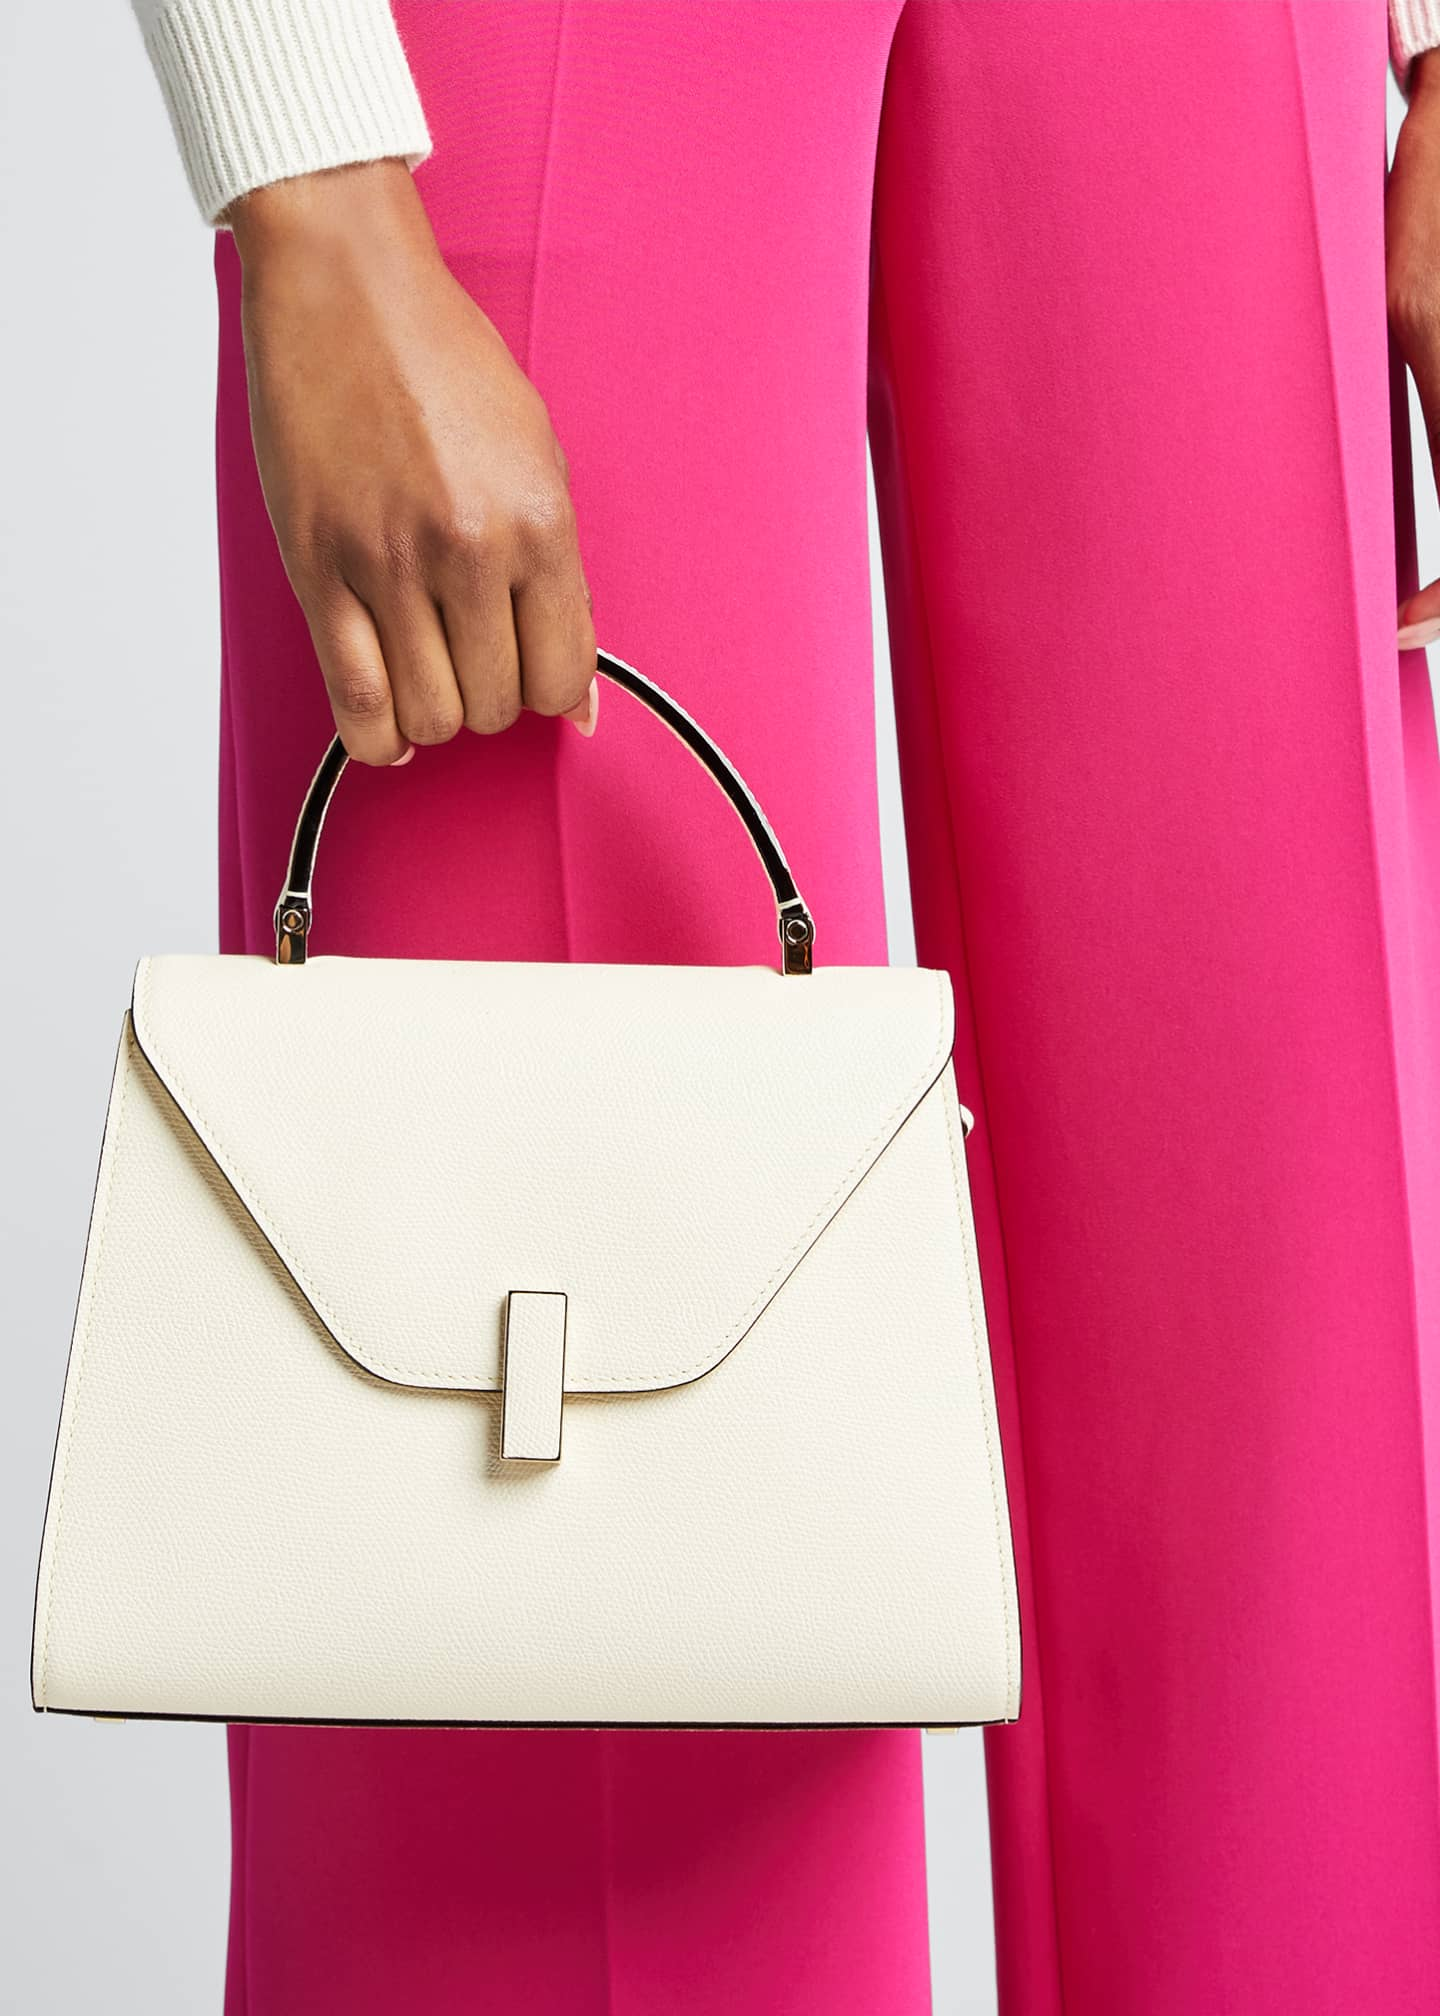 Valextra Iside Medium Leather Top-Handle Bag   Bergdorf Goodman